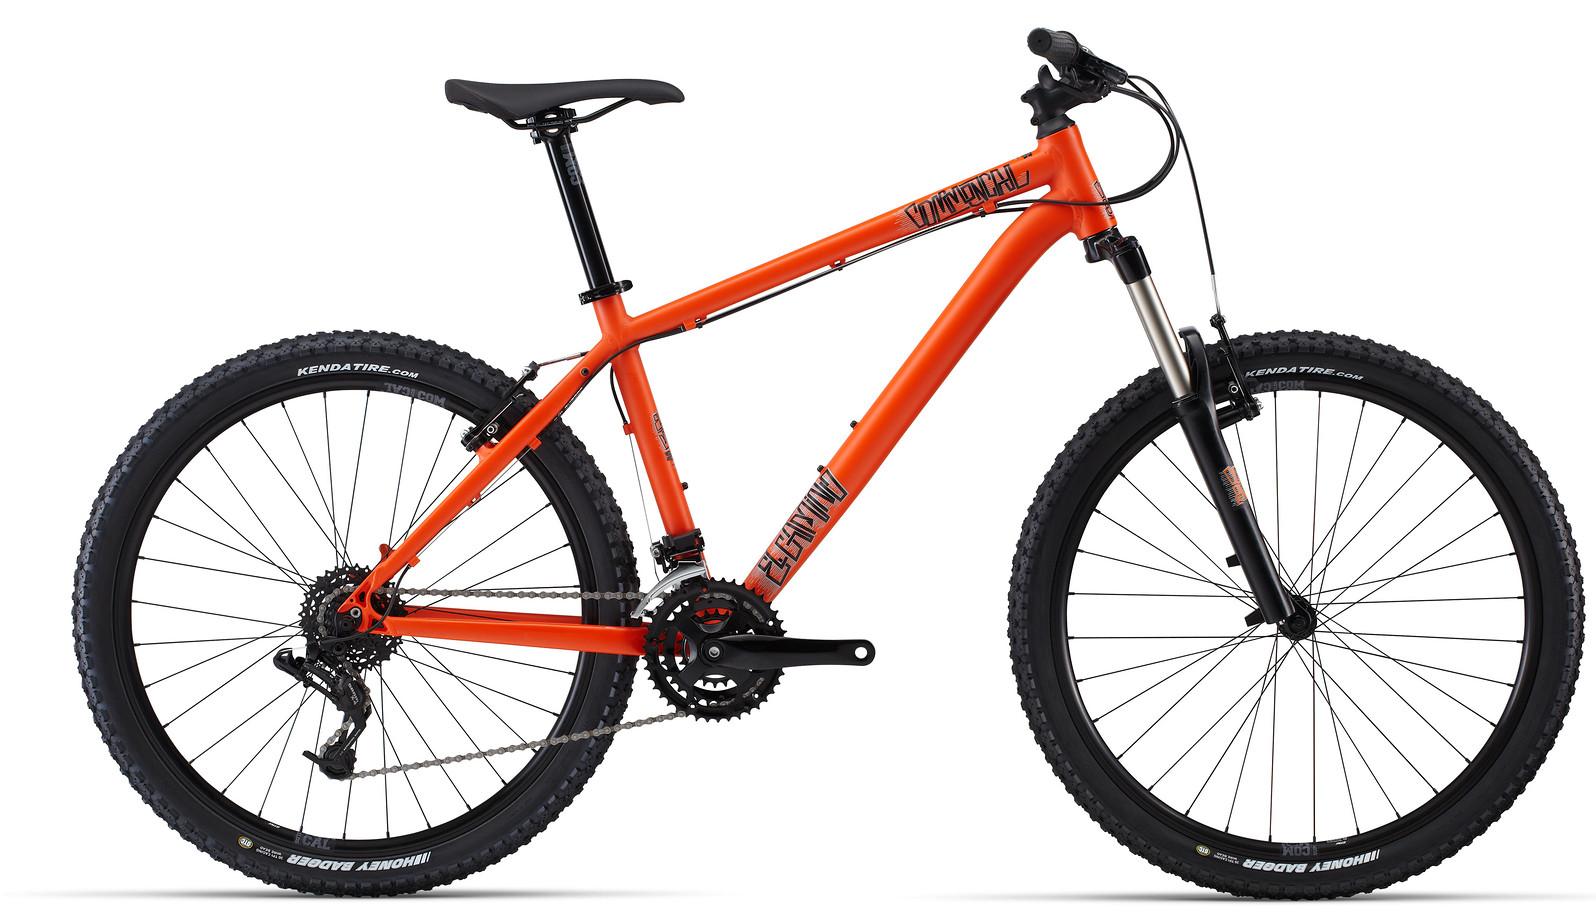 2014 Commencal Camino VB Bike 14CAMINOVB